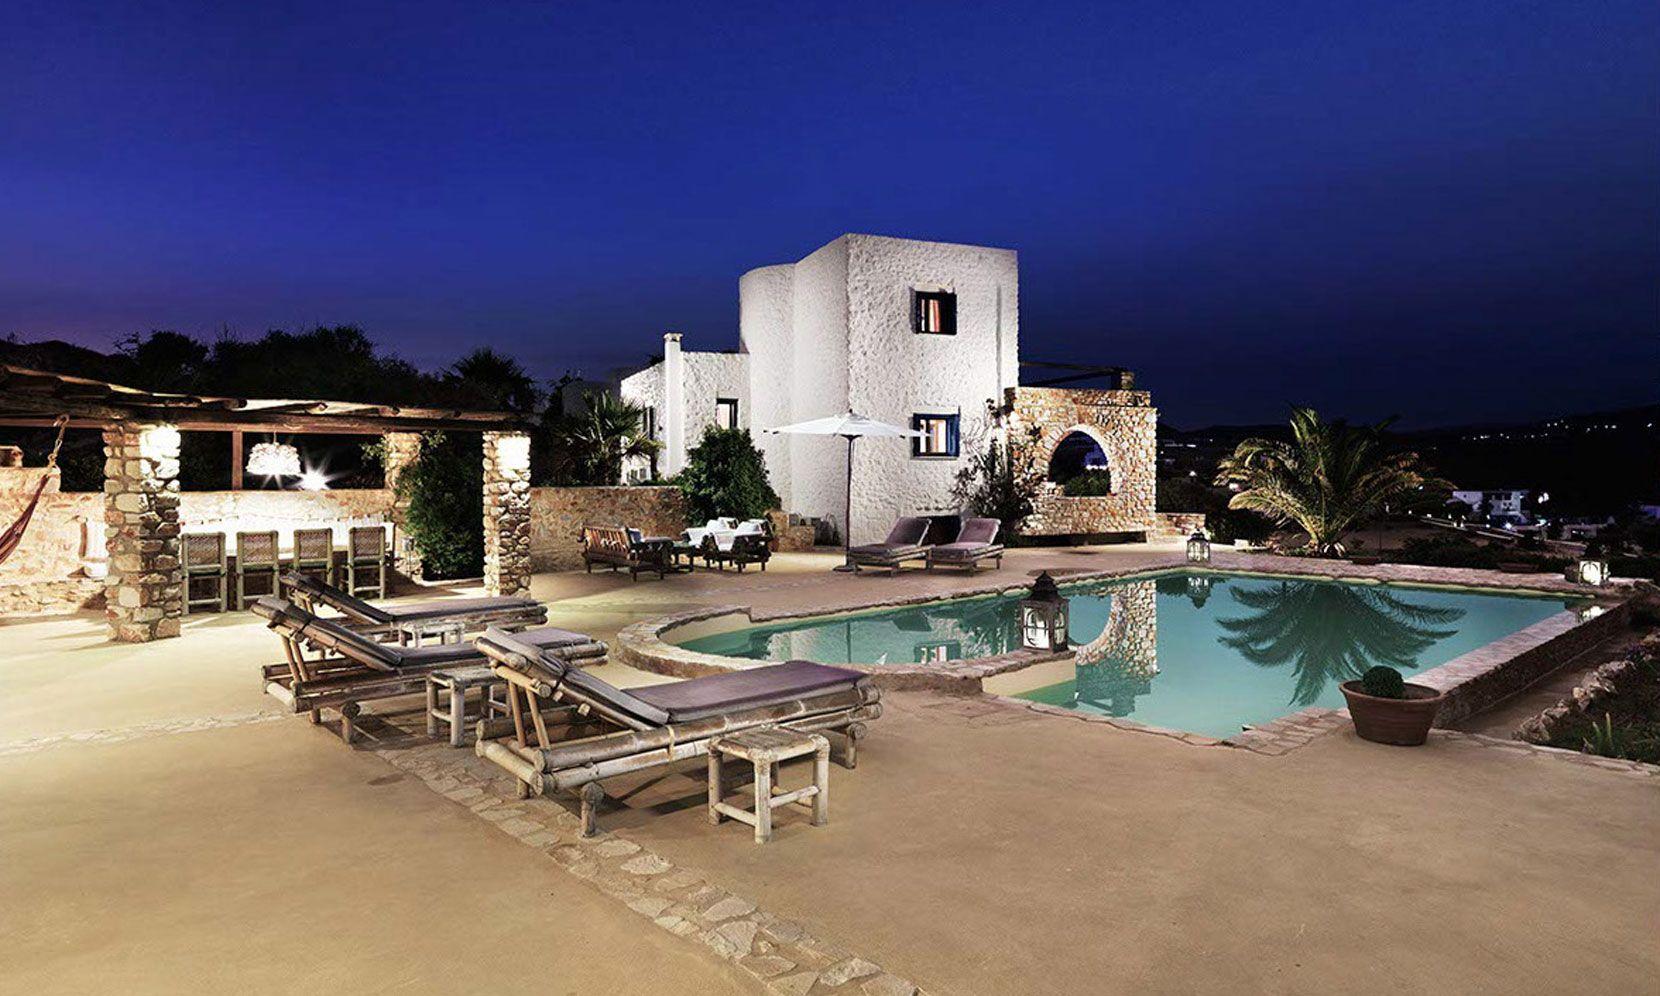 Paros Villa Philomela jumbotron image